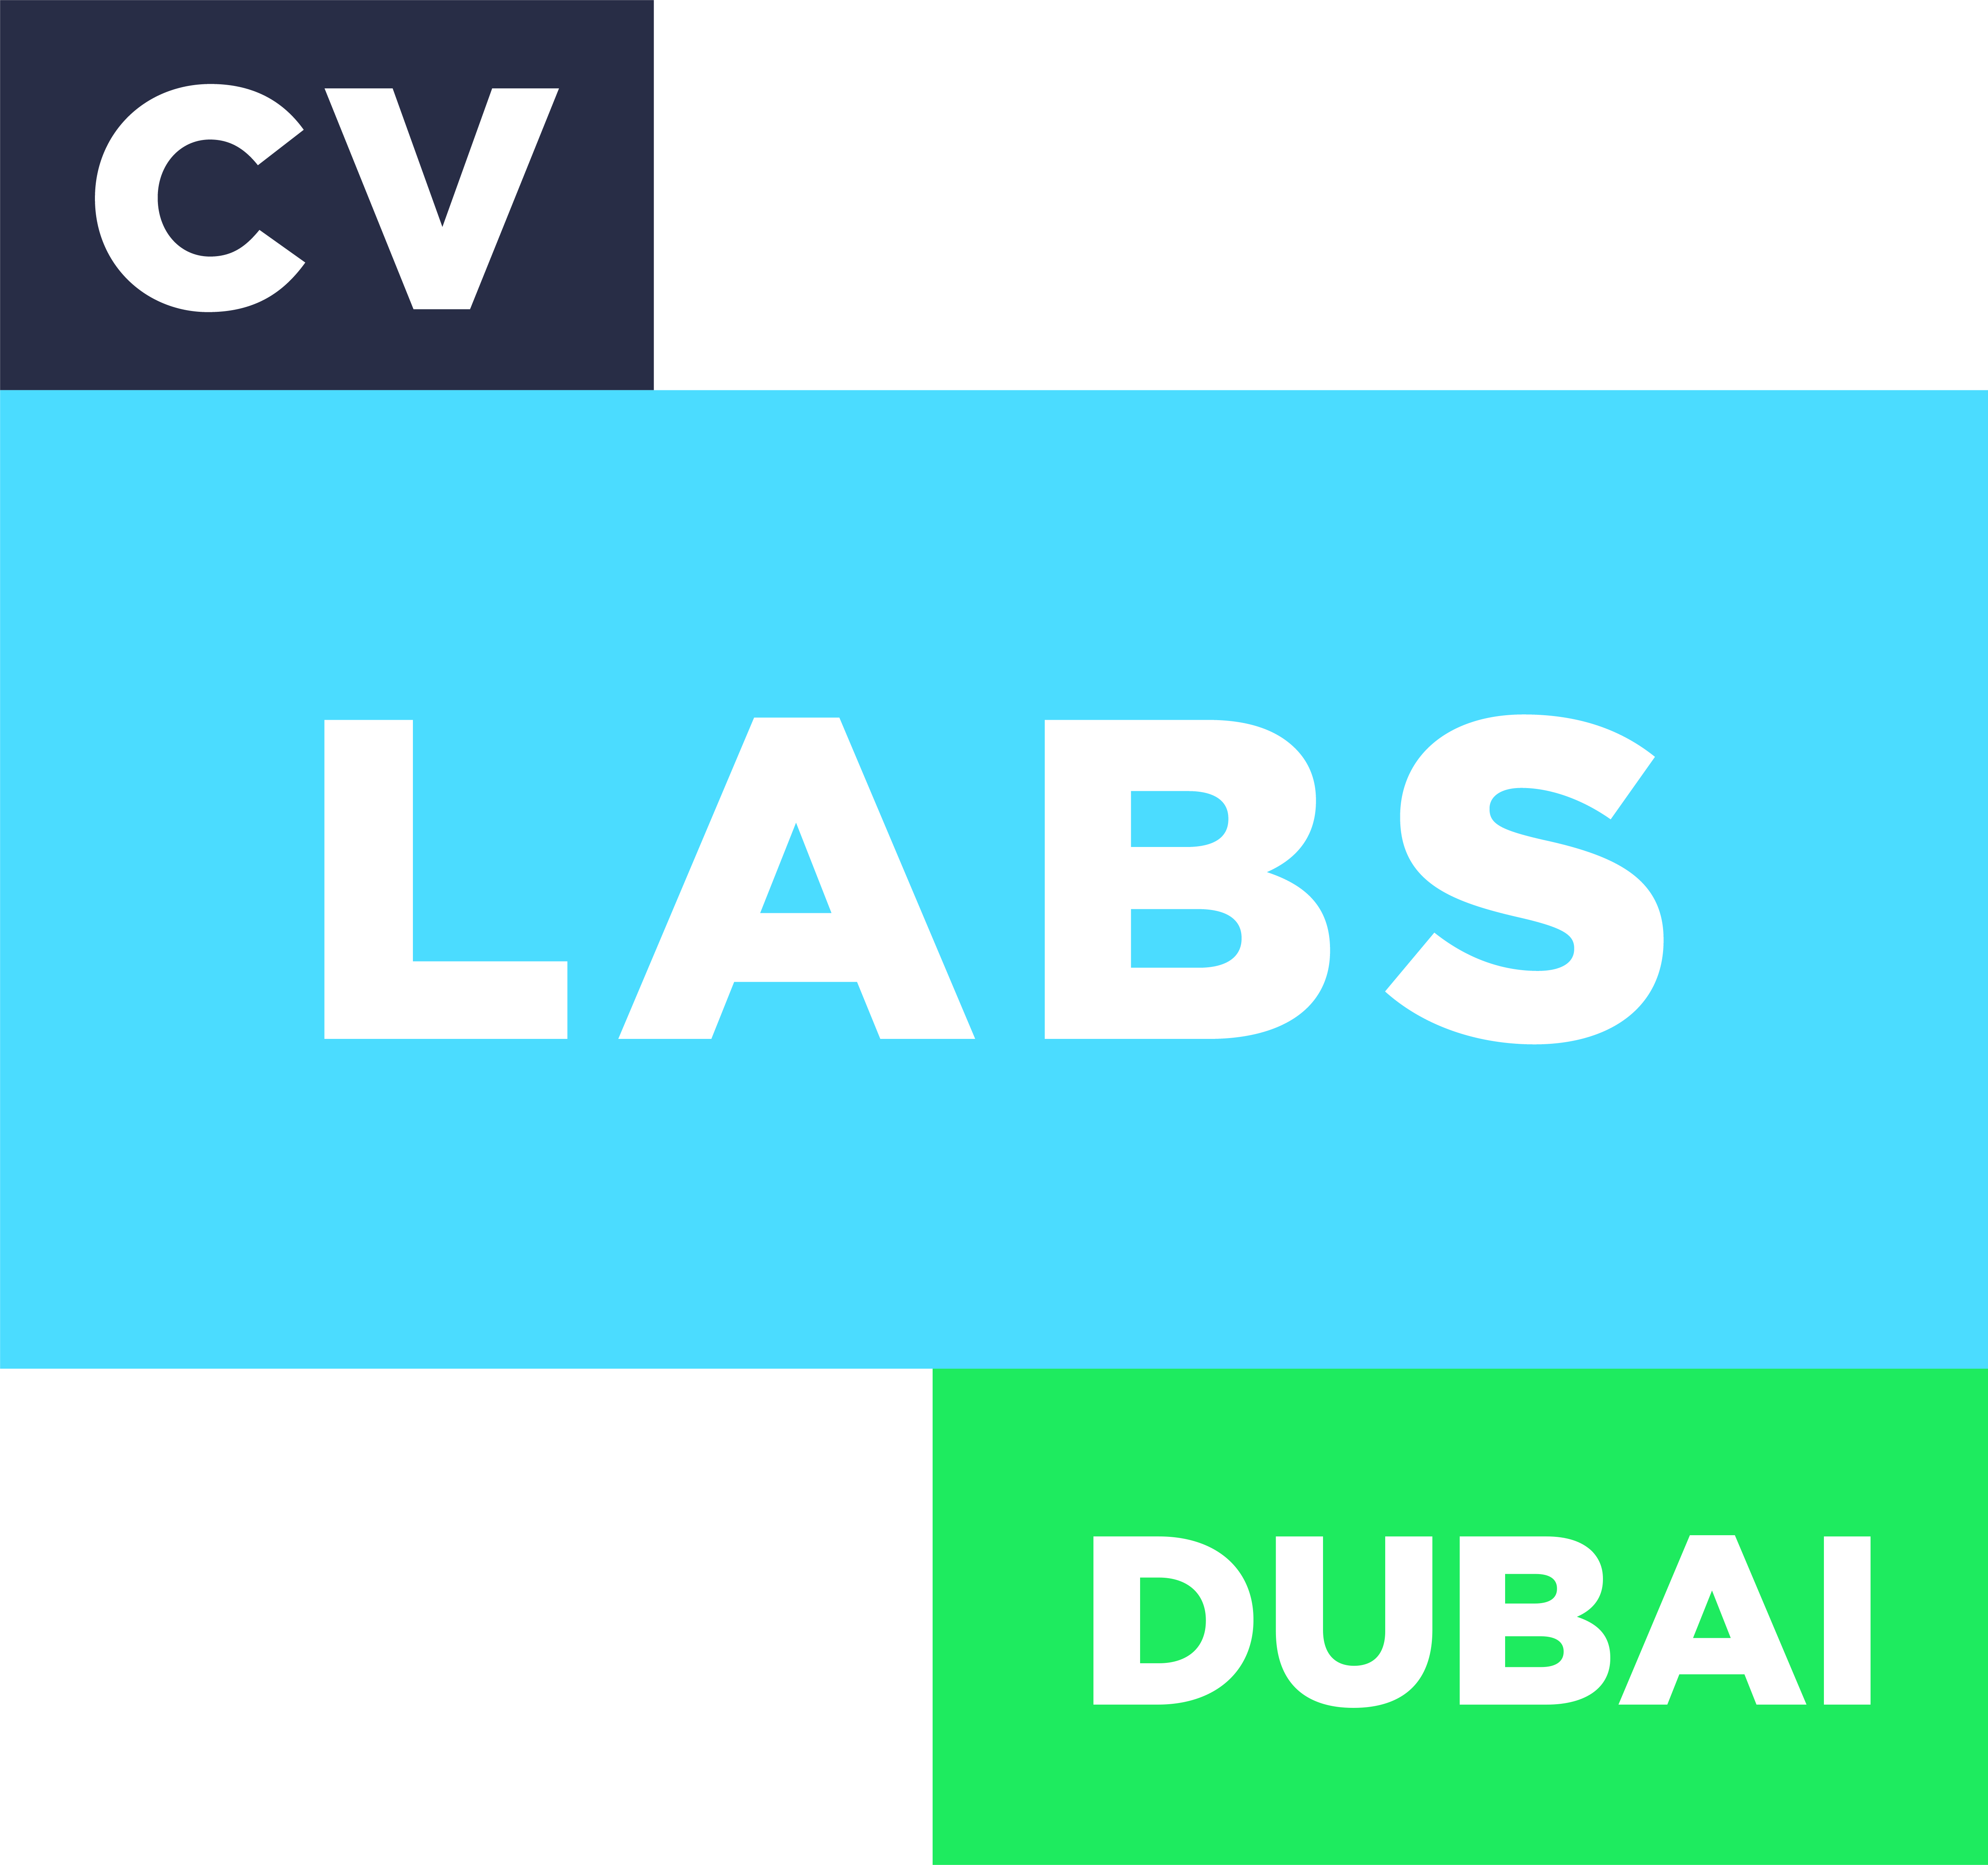 cv-labs-2